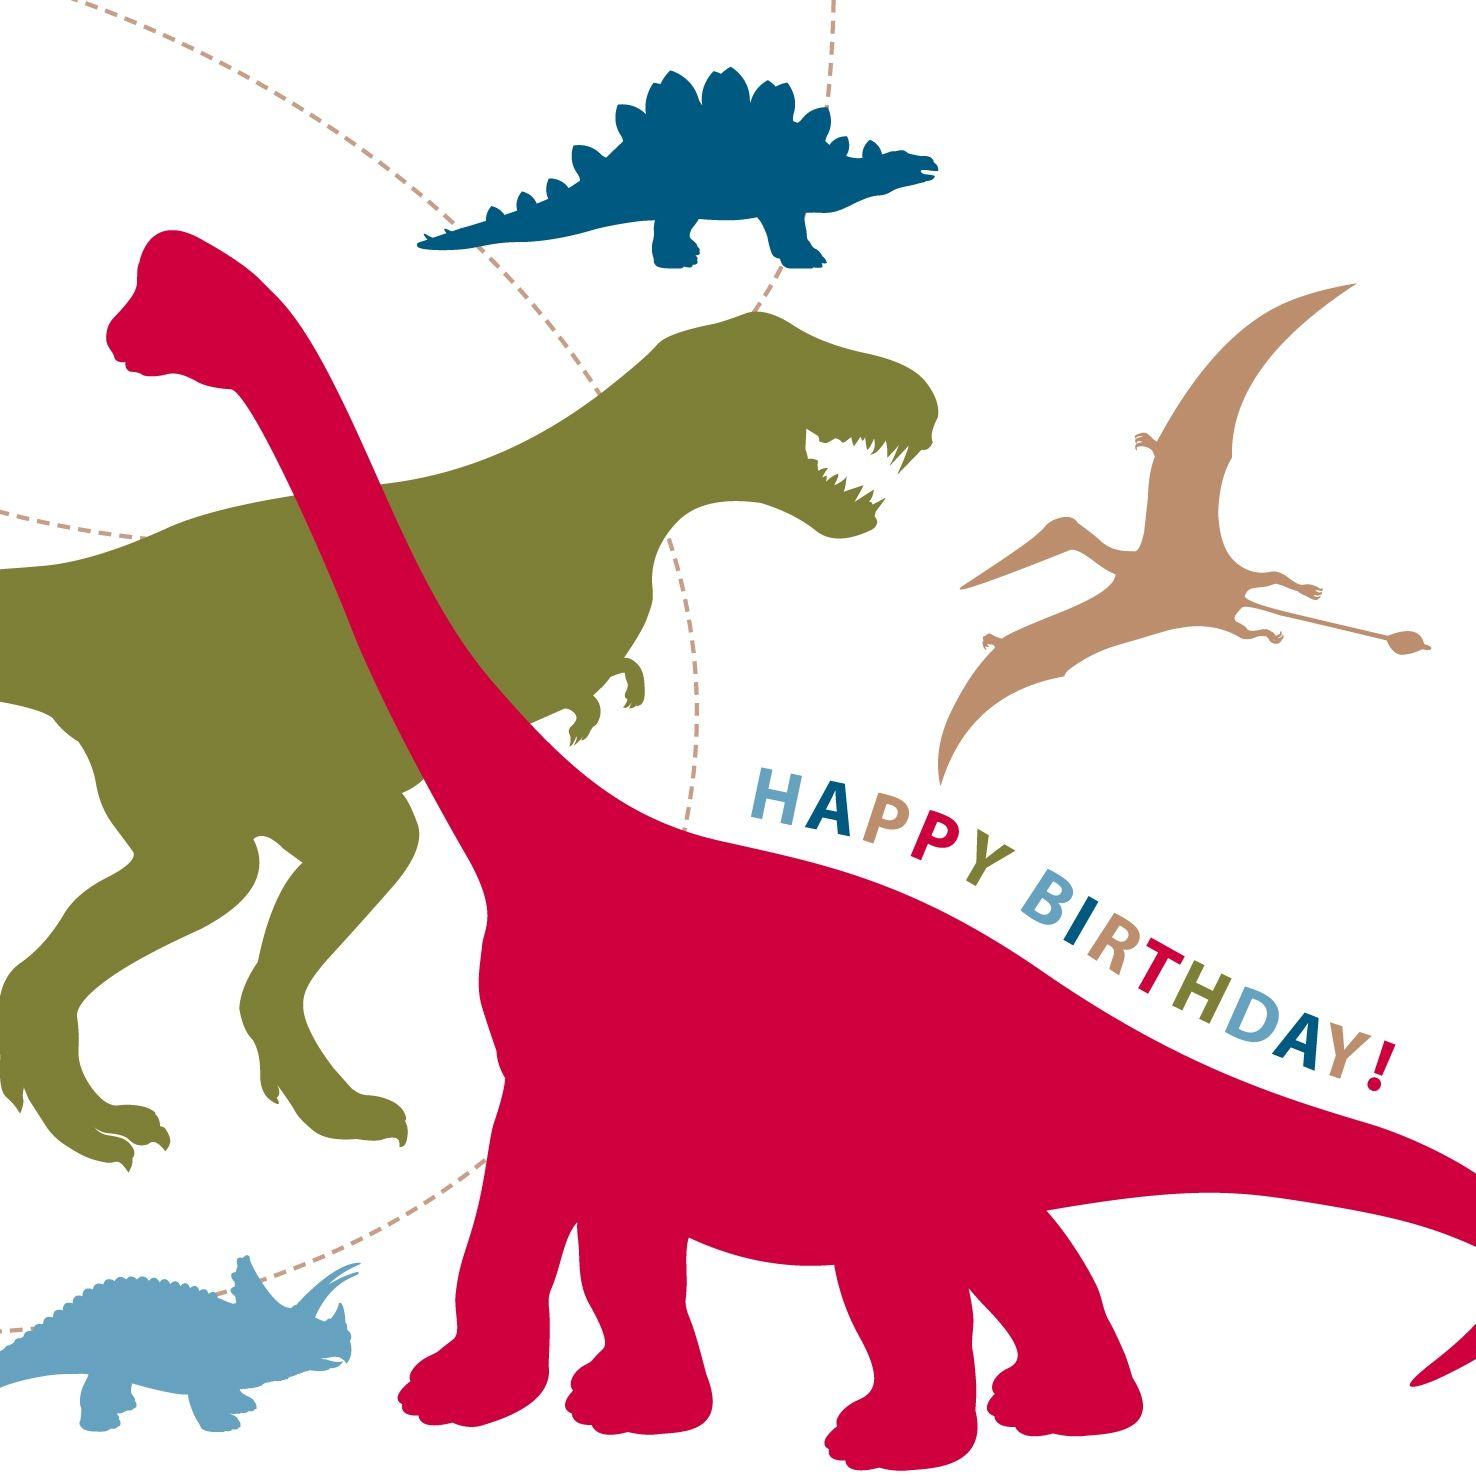 Dinosaur Birthday Card by Just Smitten | Birthday cards ...